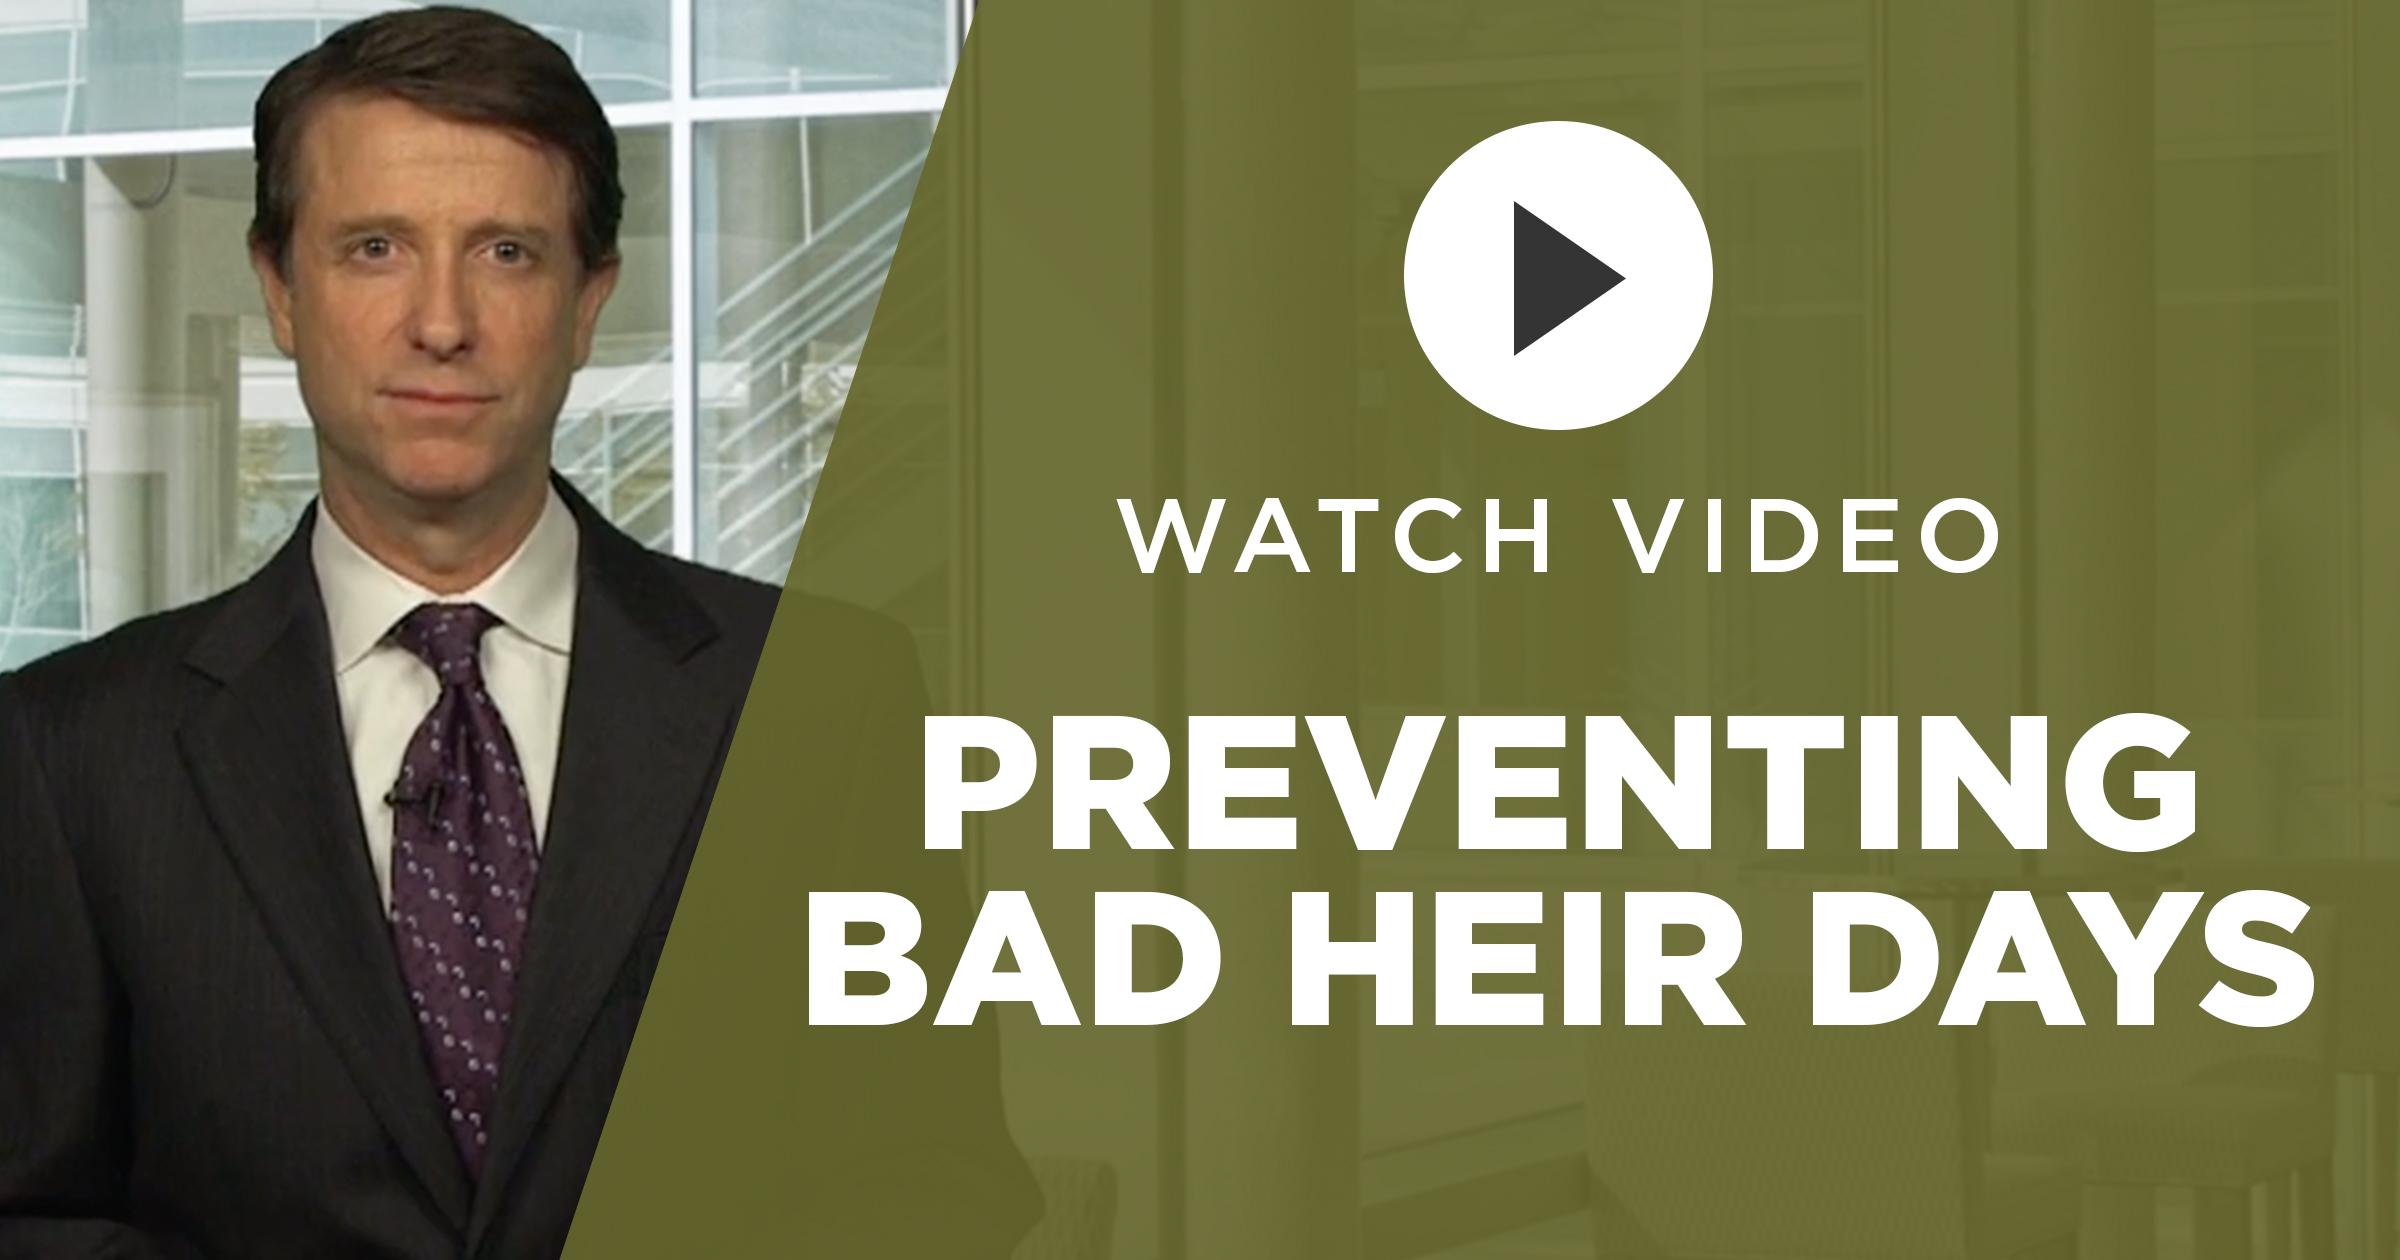 Preventing Bad Heir Days